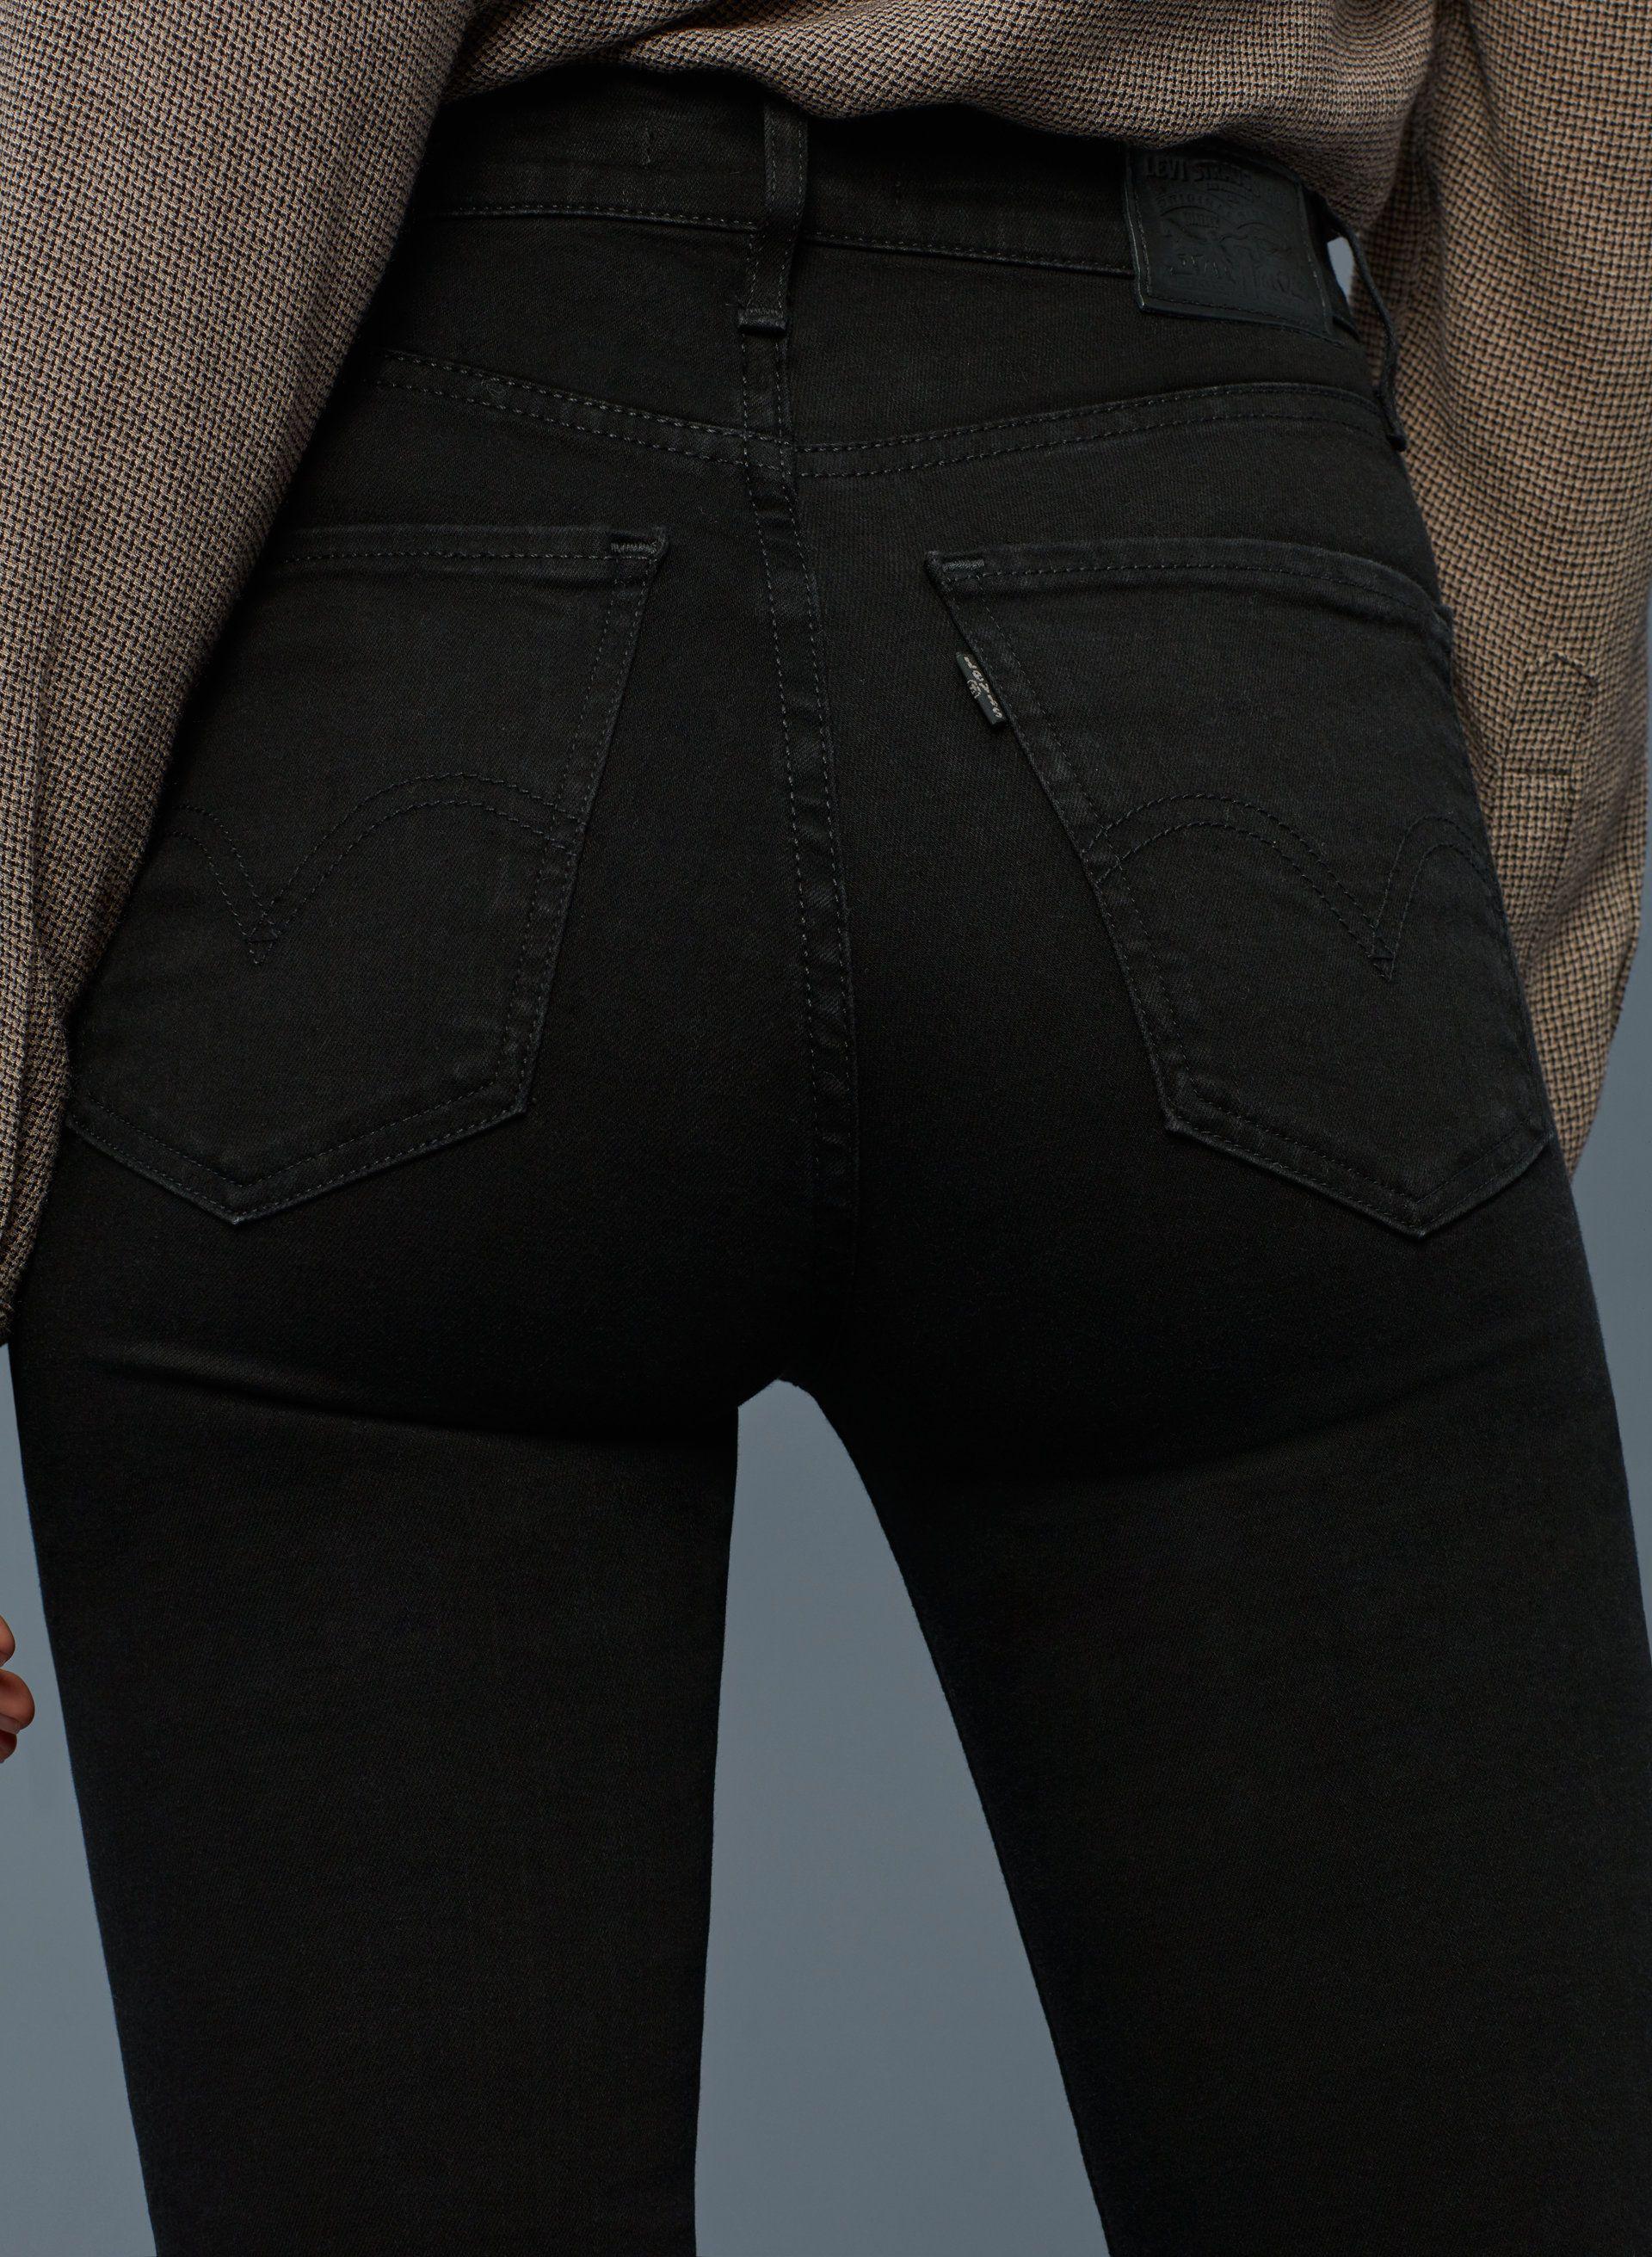 0f802dd0da32 Mile high night | clothes | Jeans, High jeans, Black levi jeans